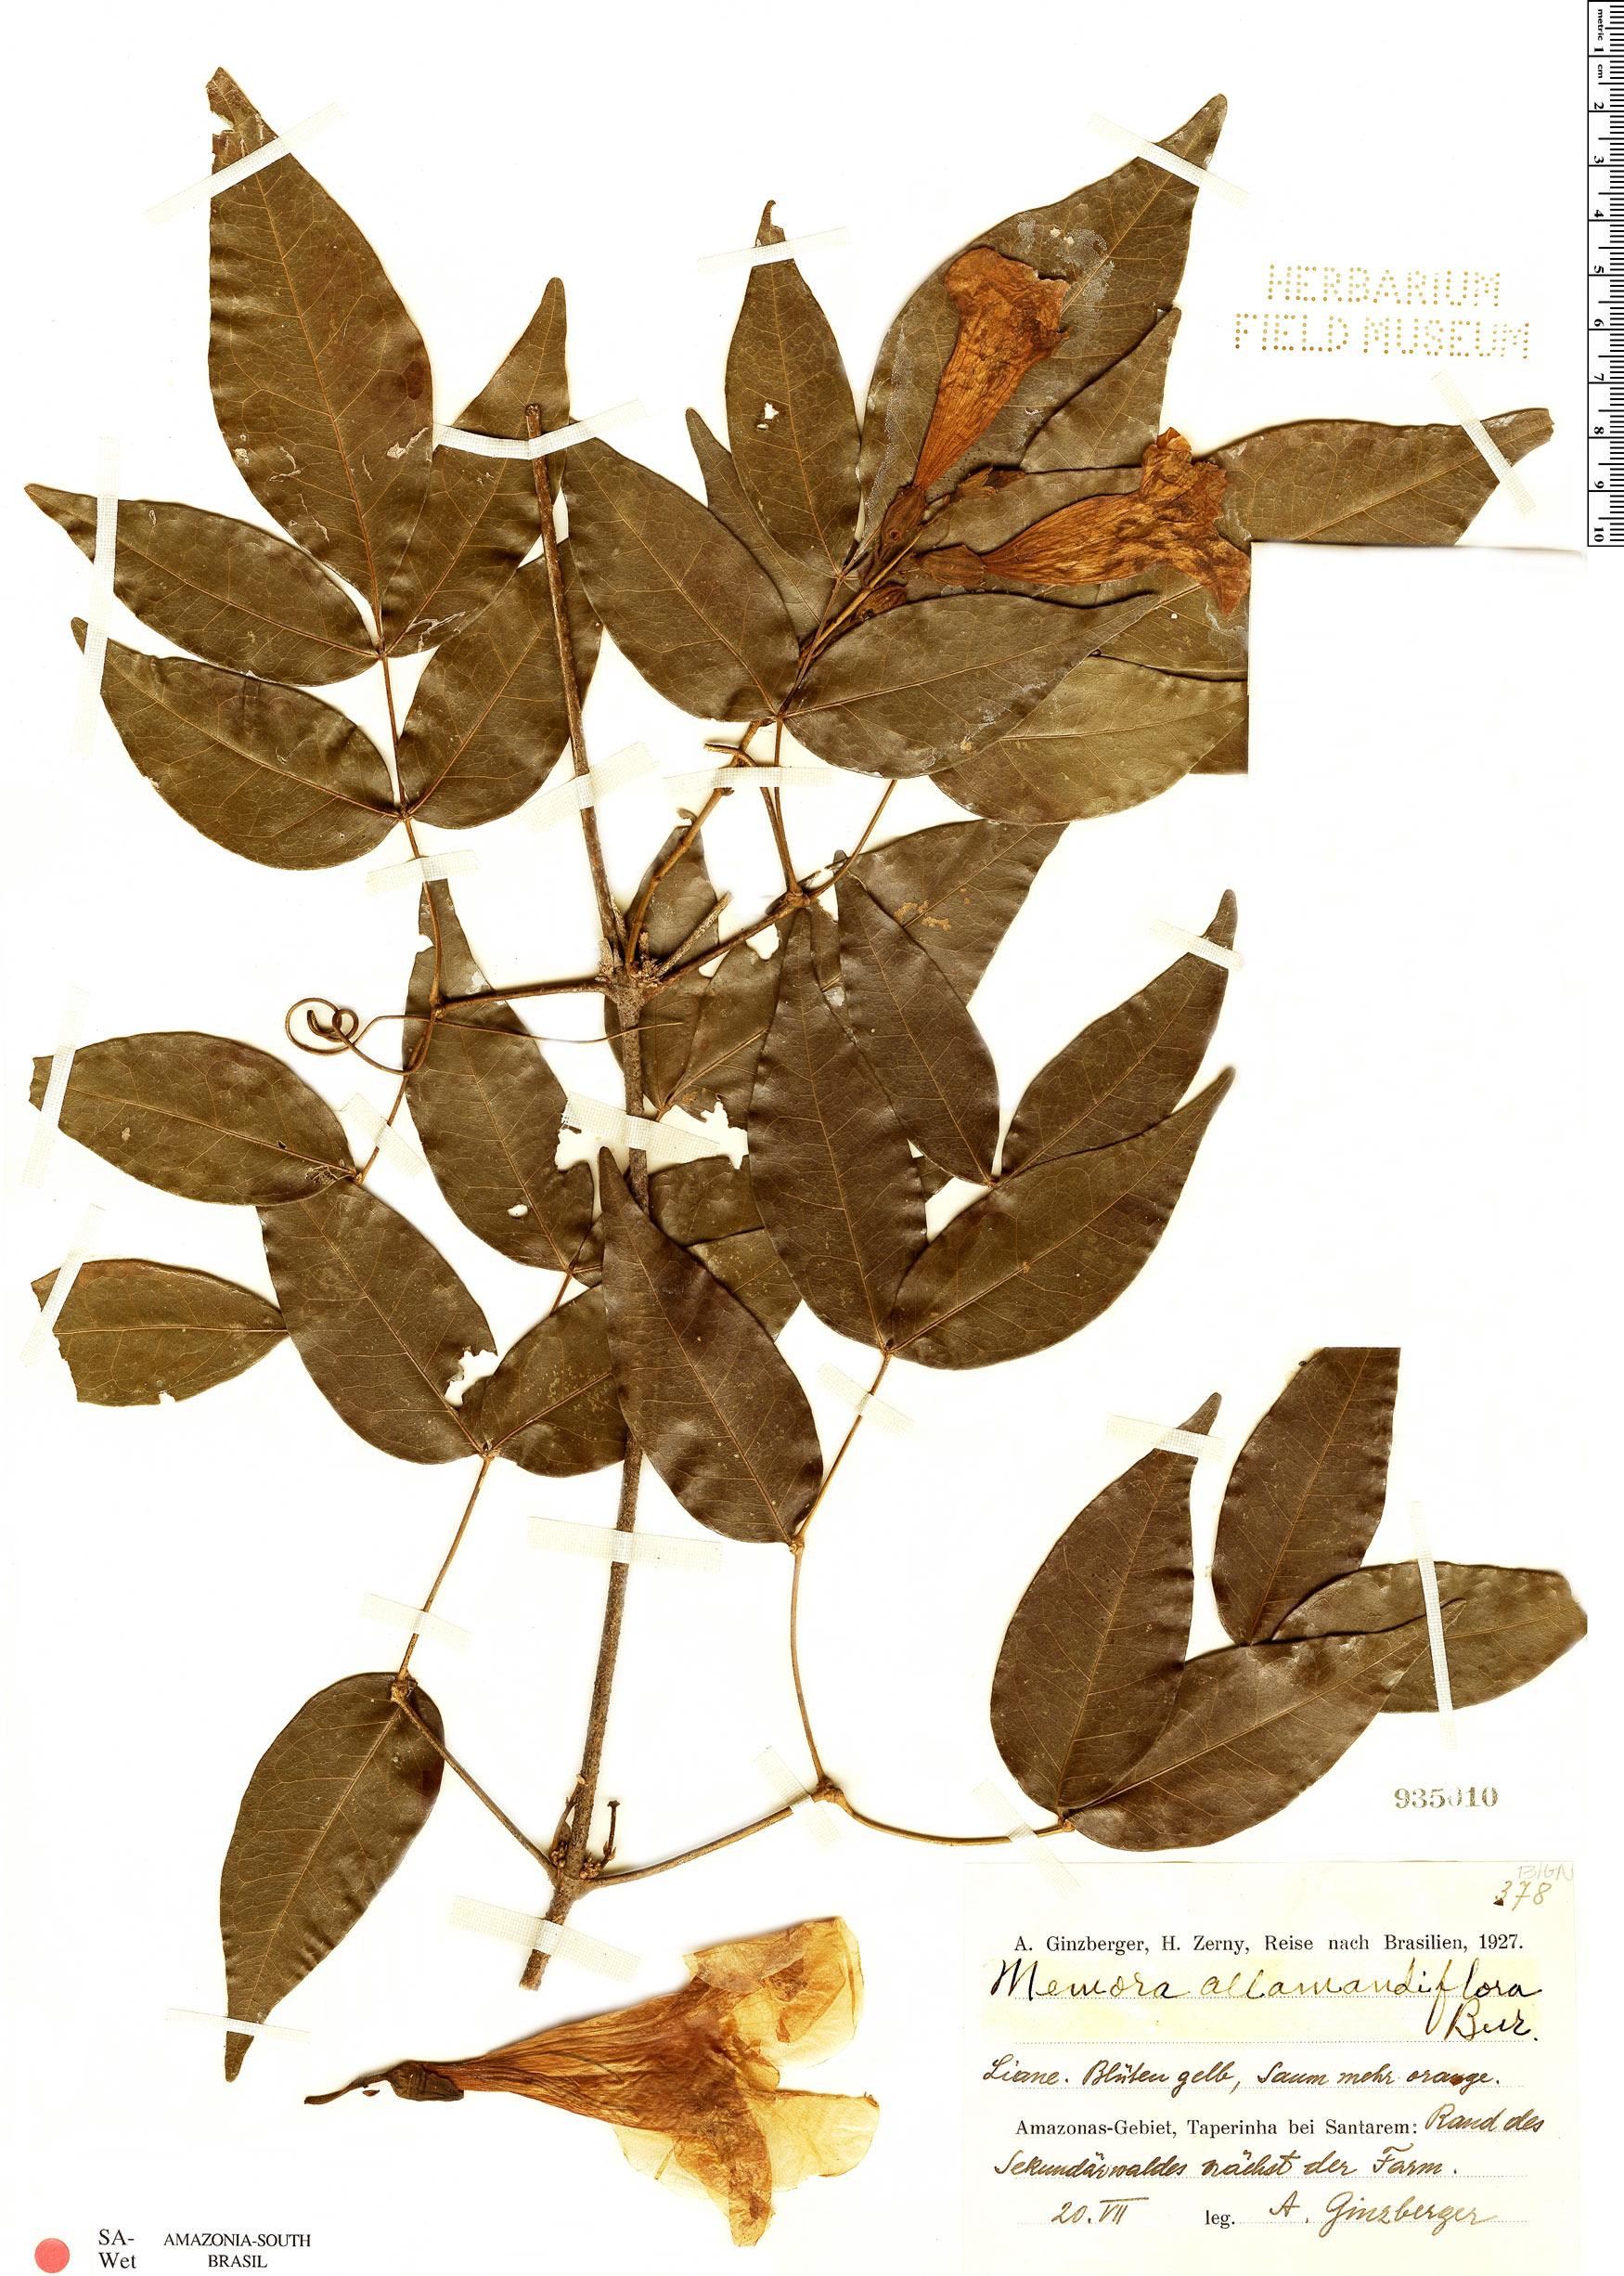 Espécimen: Adenocalymma allamandiflorum